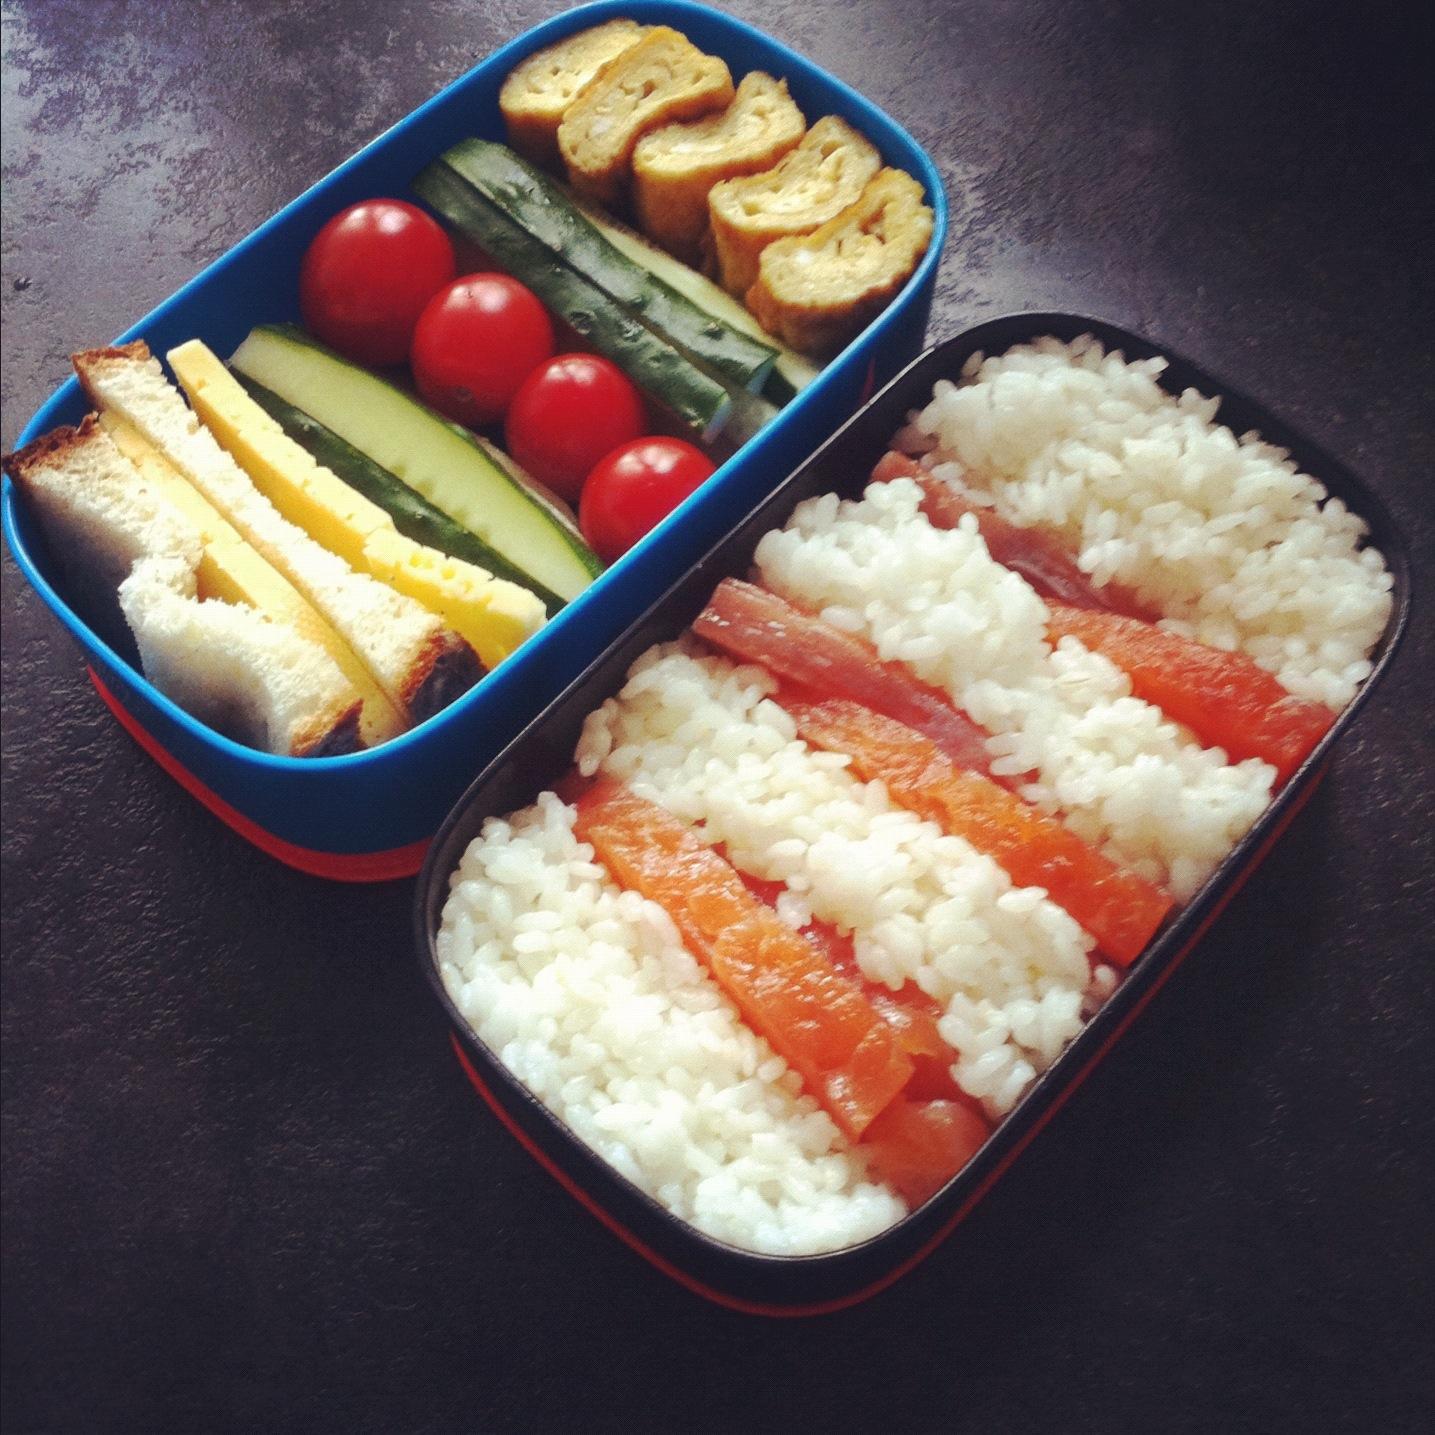 бенто рецепт обеда рис лосось омлет овощи